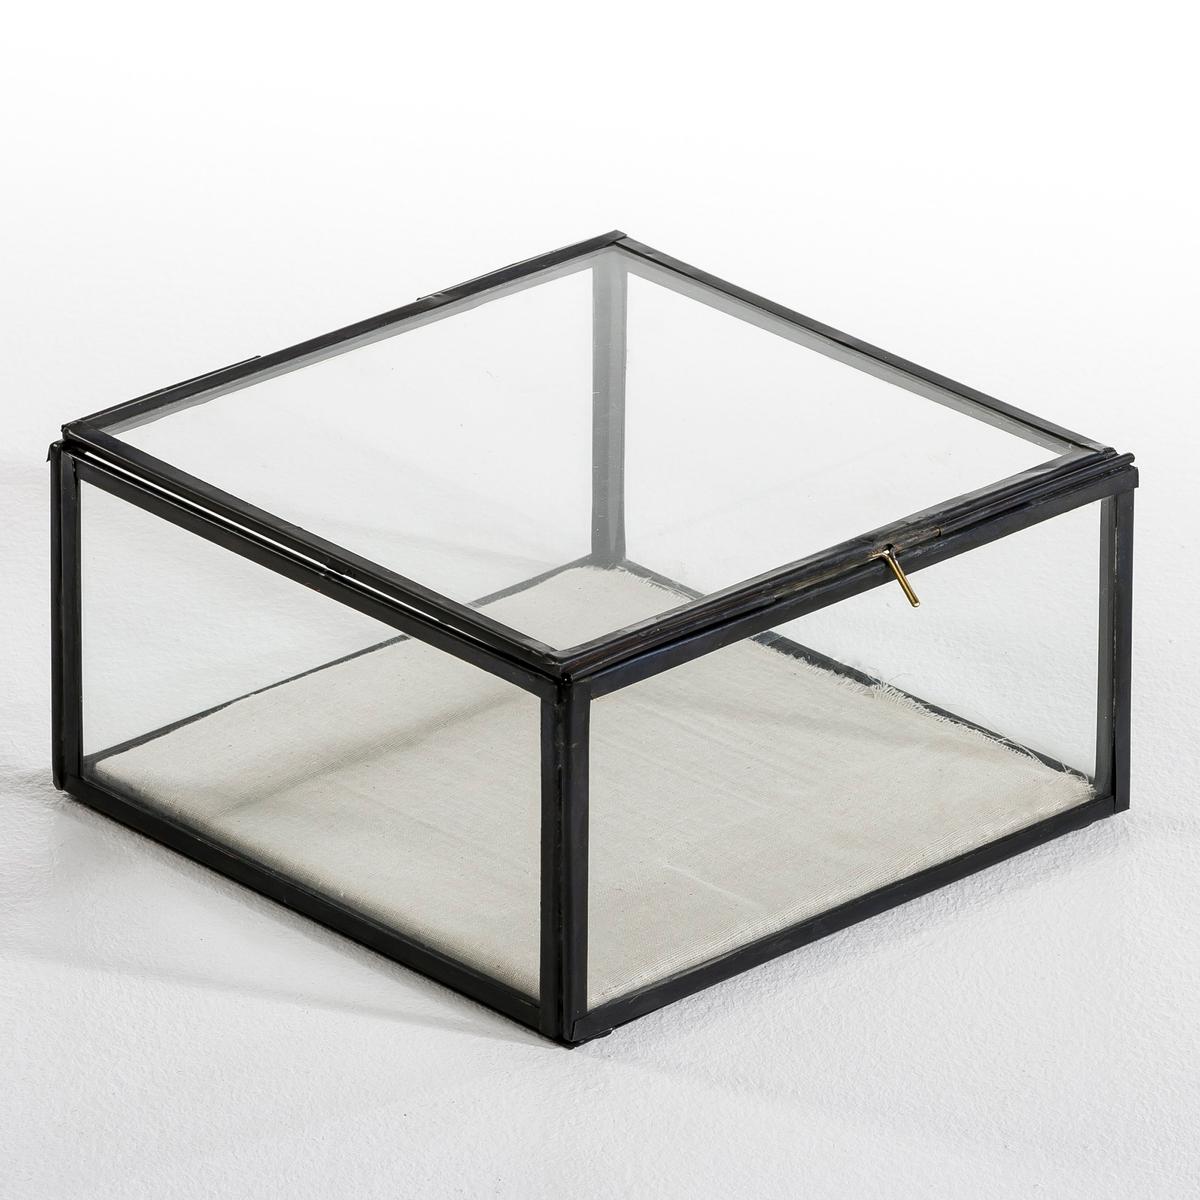 Коробка-витрина Misia, маленькая модельХарактеристики: Из стекла и металла Размеры :Д. 20 x В. 10,5 x Г. 20 см.<br><br>Цвет: латунь,металл,черный